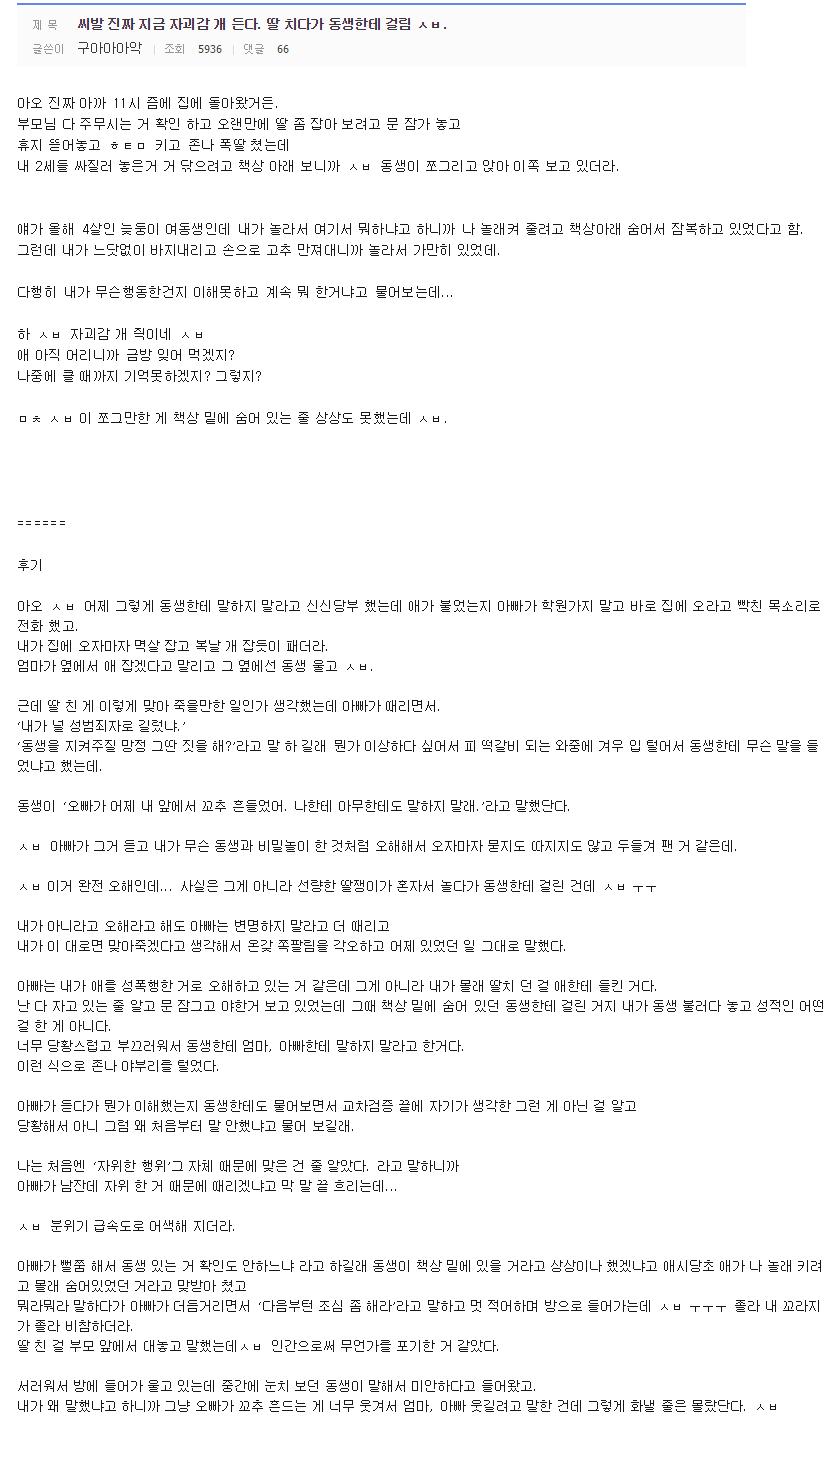 61dcd8cf8481eb7ba0a7a516f57c2a28.png